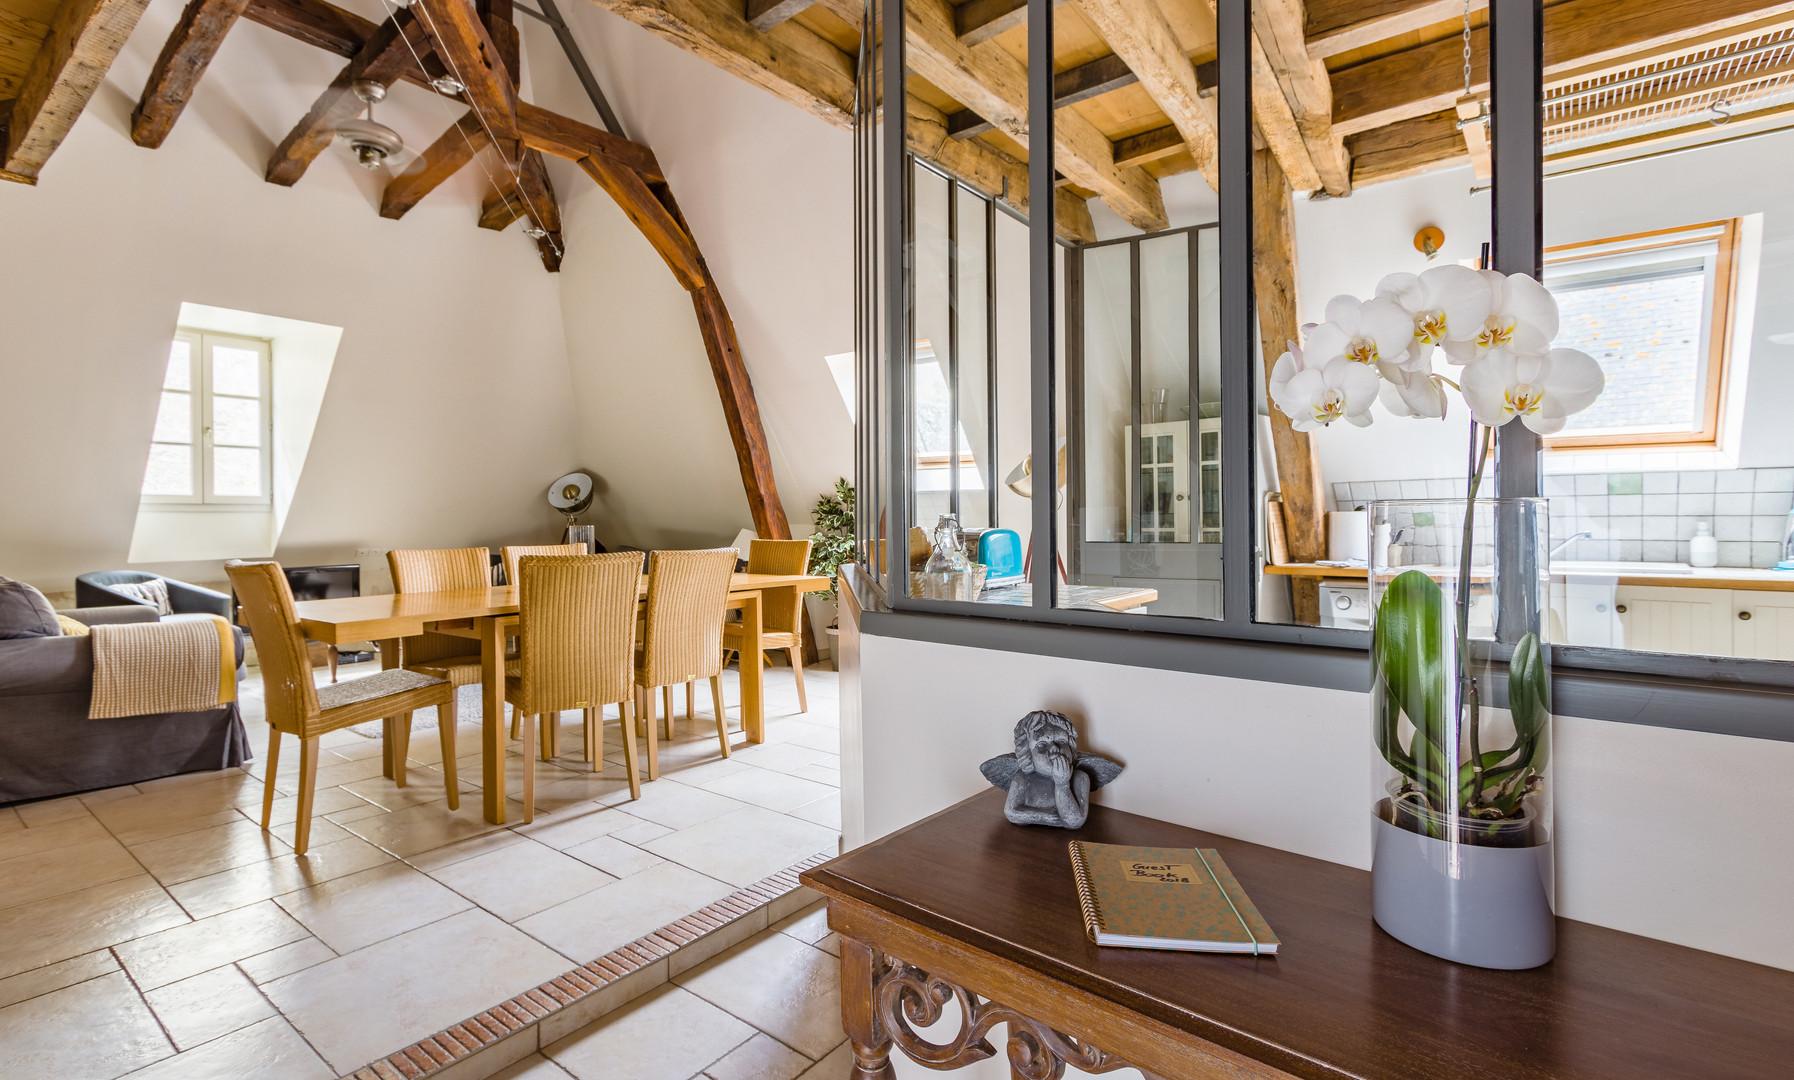 VillaConcorde-Chambord100718-15.jpg